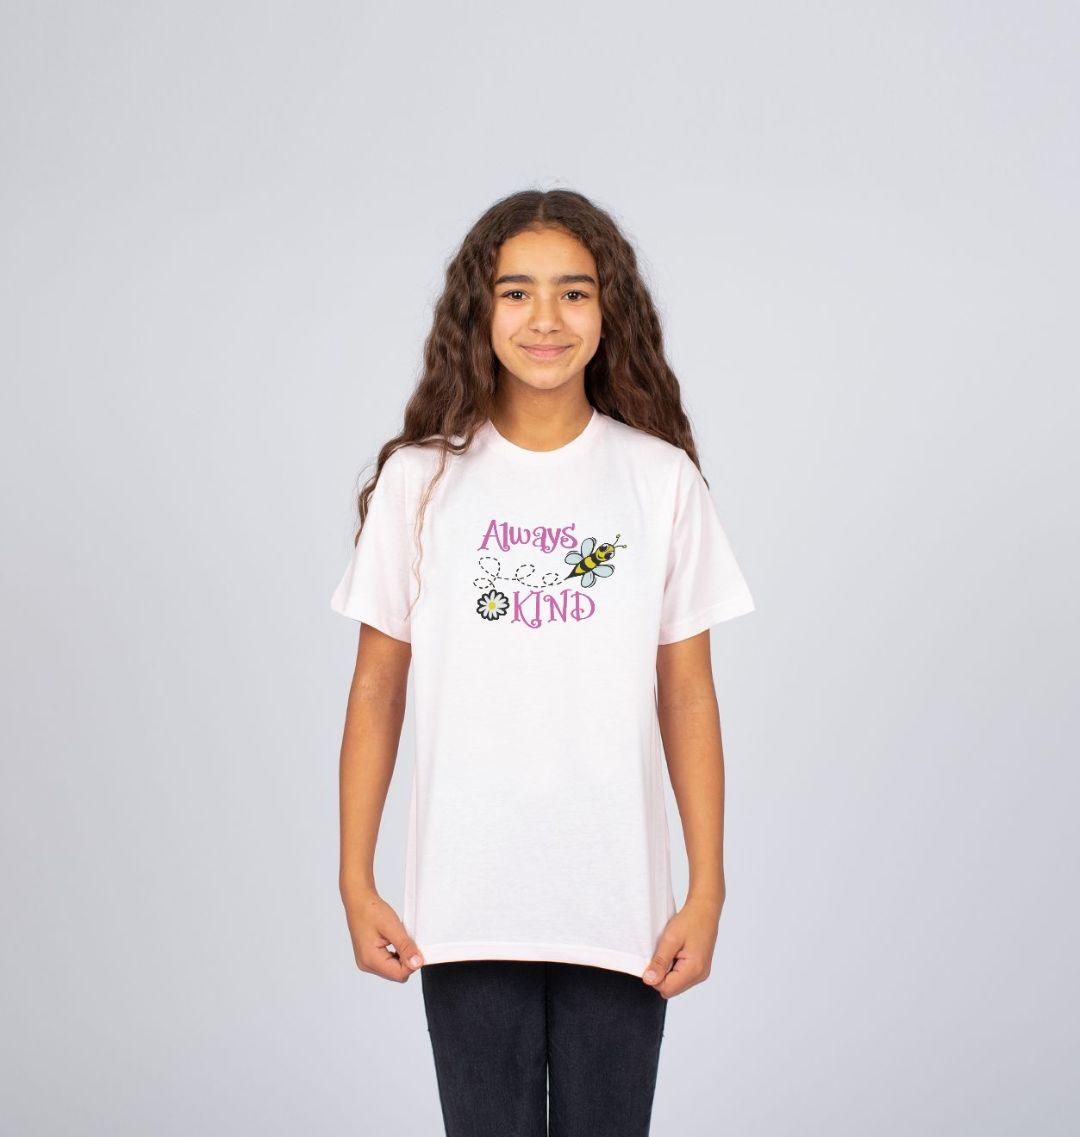 'Always Be Kind' Children's T Shirt - Soft Organic Cotton pink